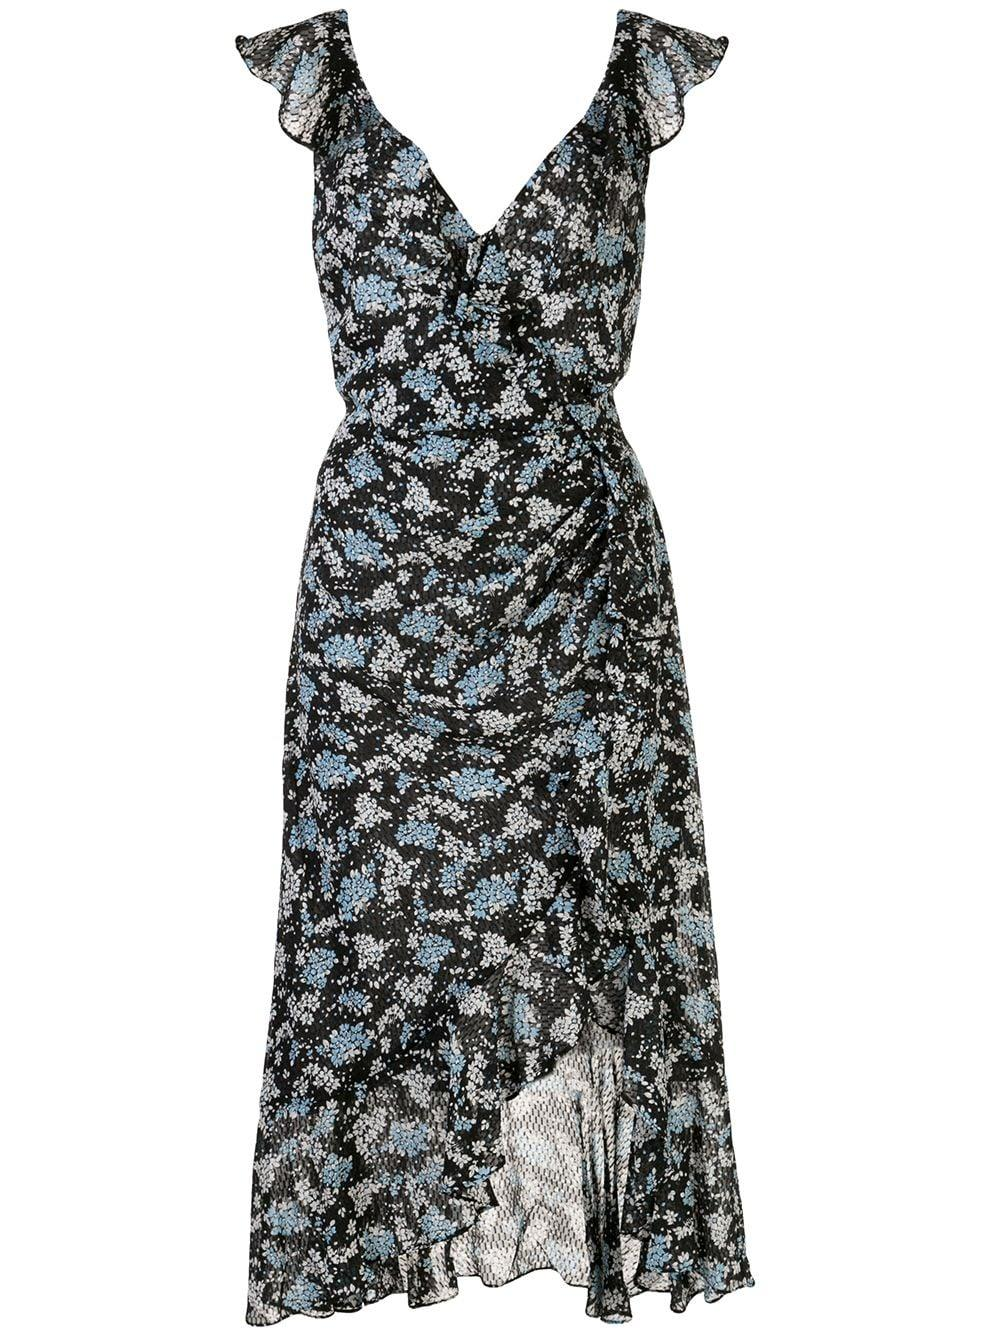 Amal Dress Item # 2002NP0112840